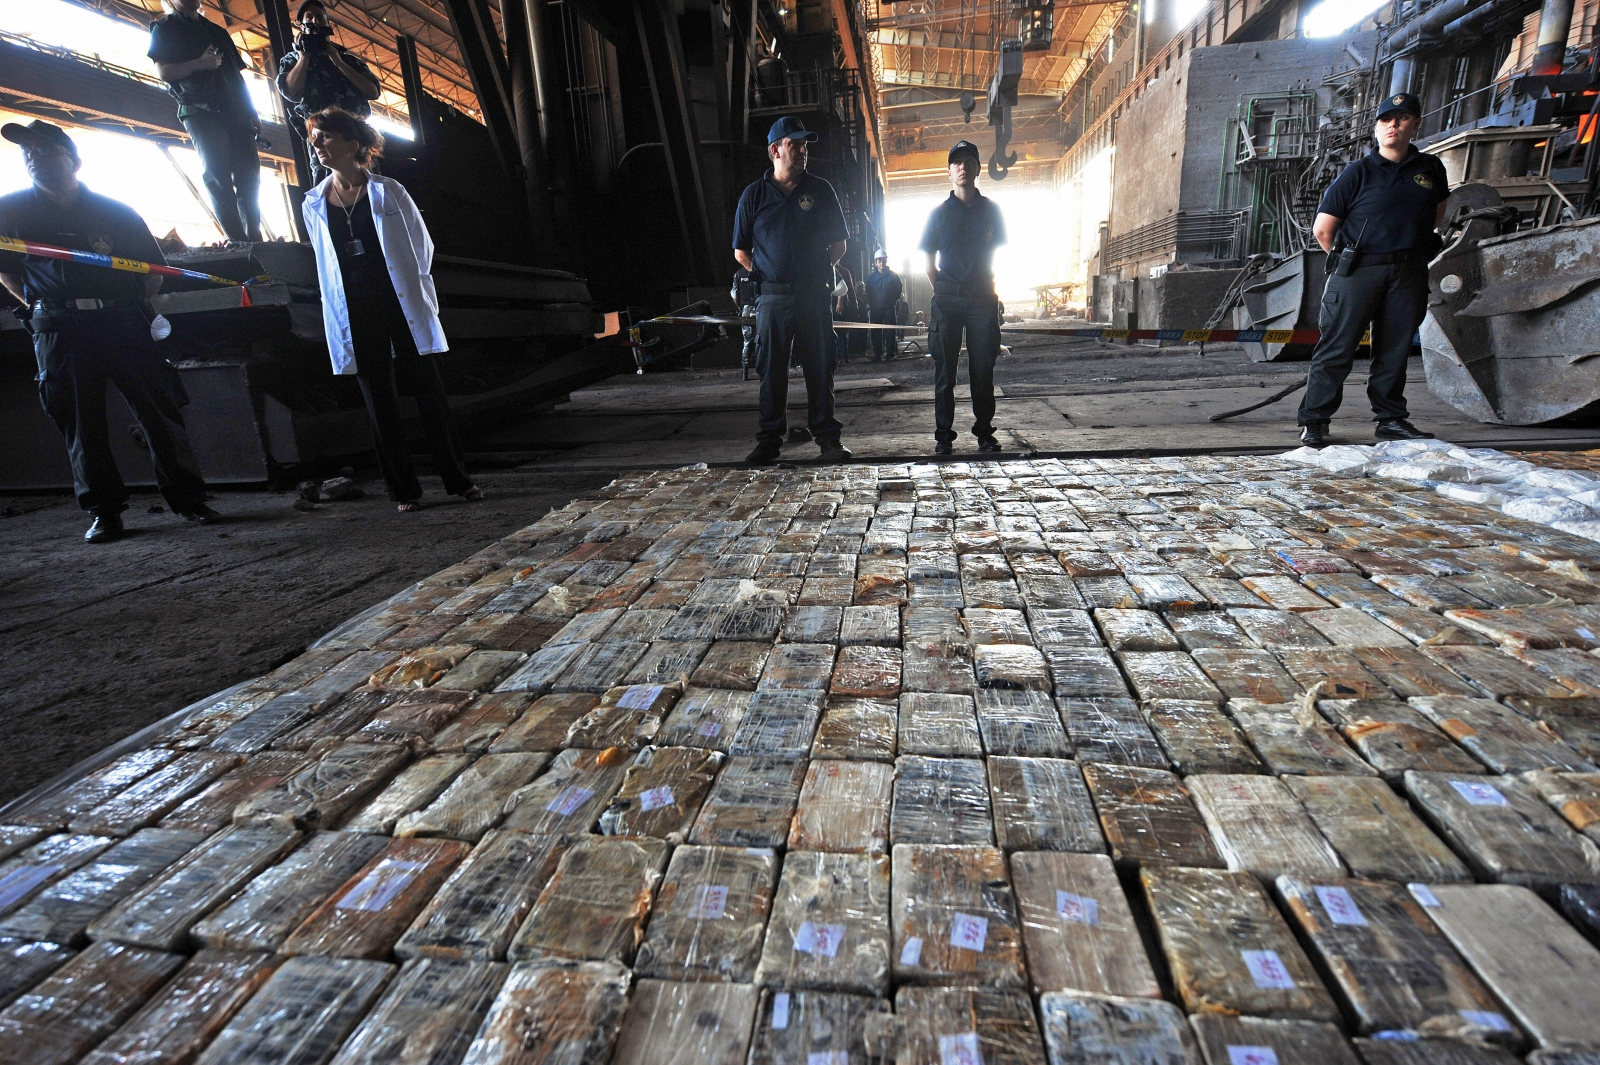 Macedonian police prepare to destroy heroin seized from gangsters in Skopje. (Getty)